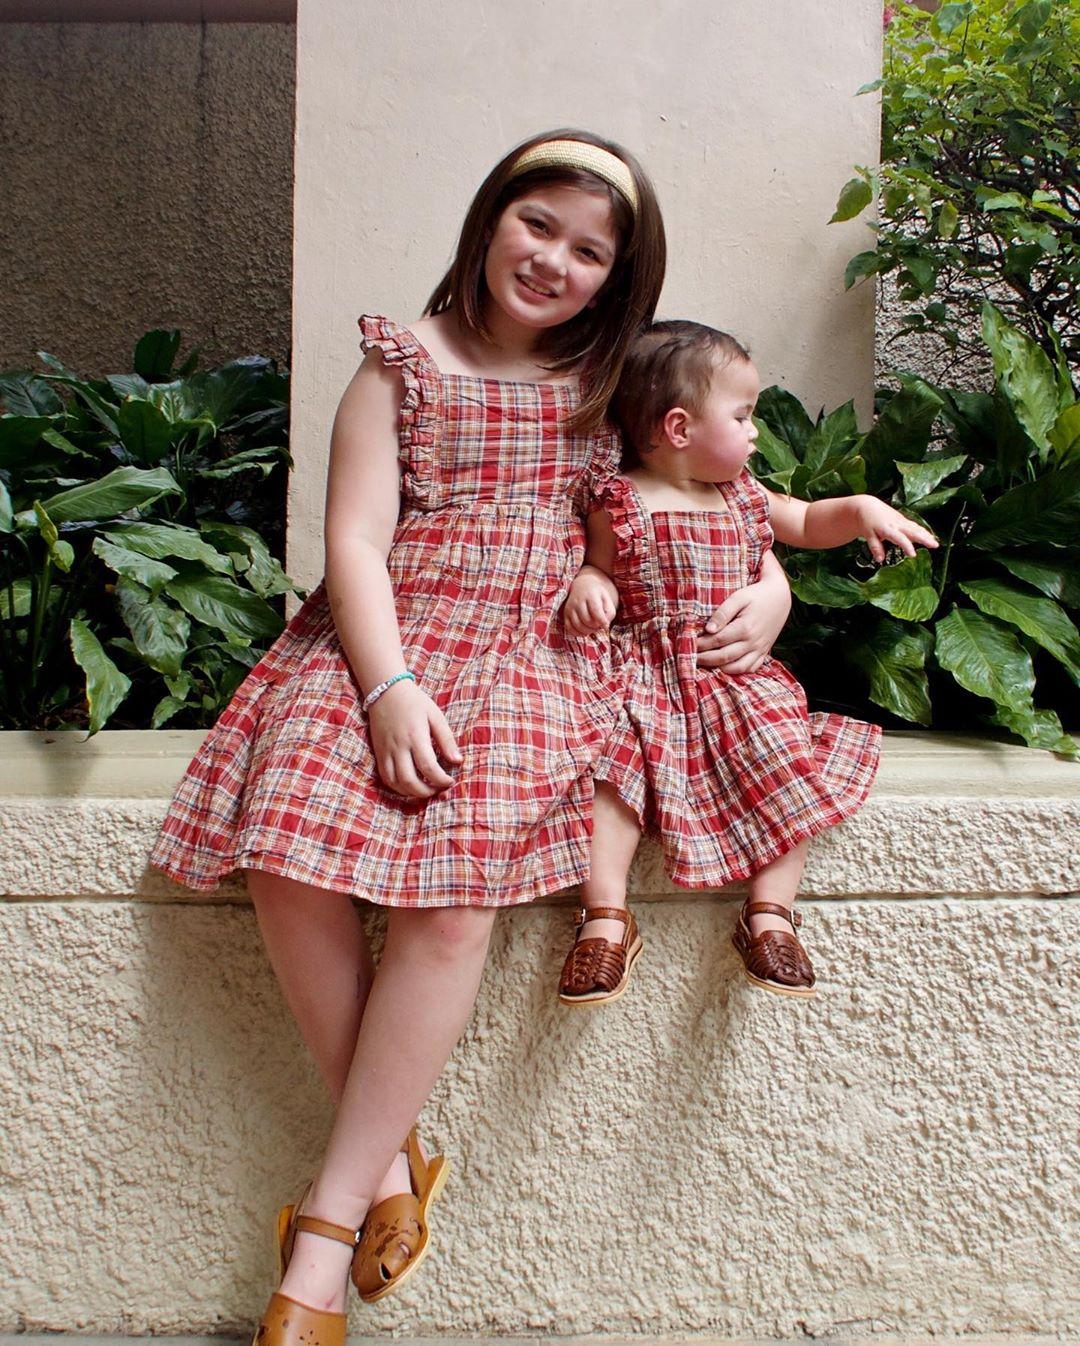 Sisters Ellie Eigenmann and Lilo Eigenmann-Alipayo in matching plaid outfits